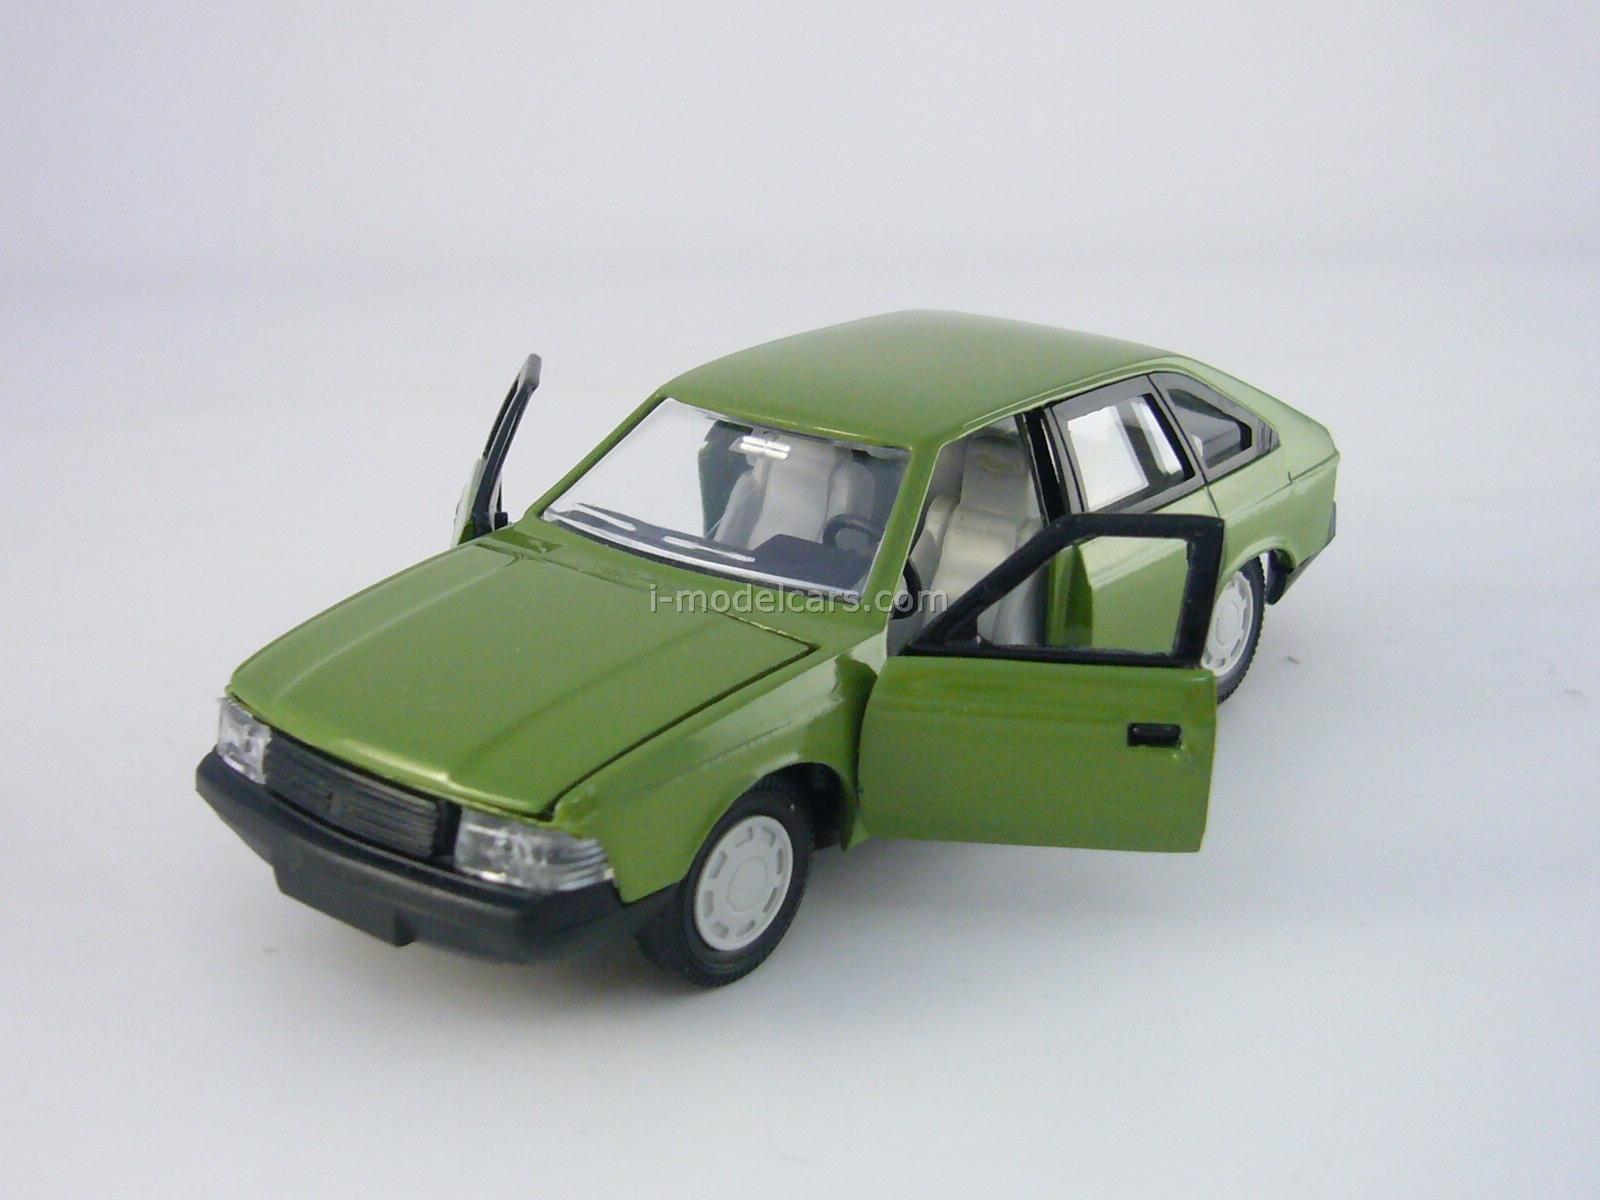 Moskvich-2141 green 1:43 Agat Mossar Tantal